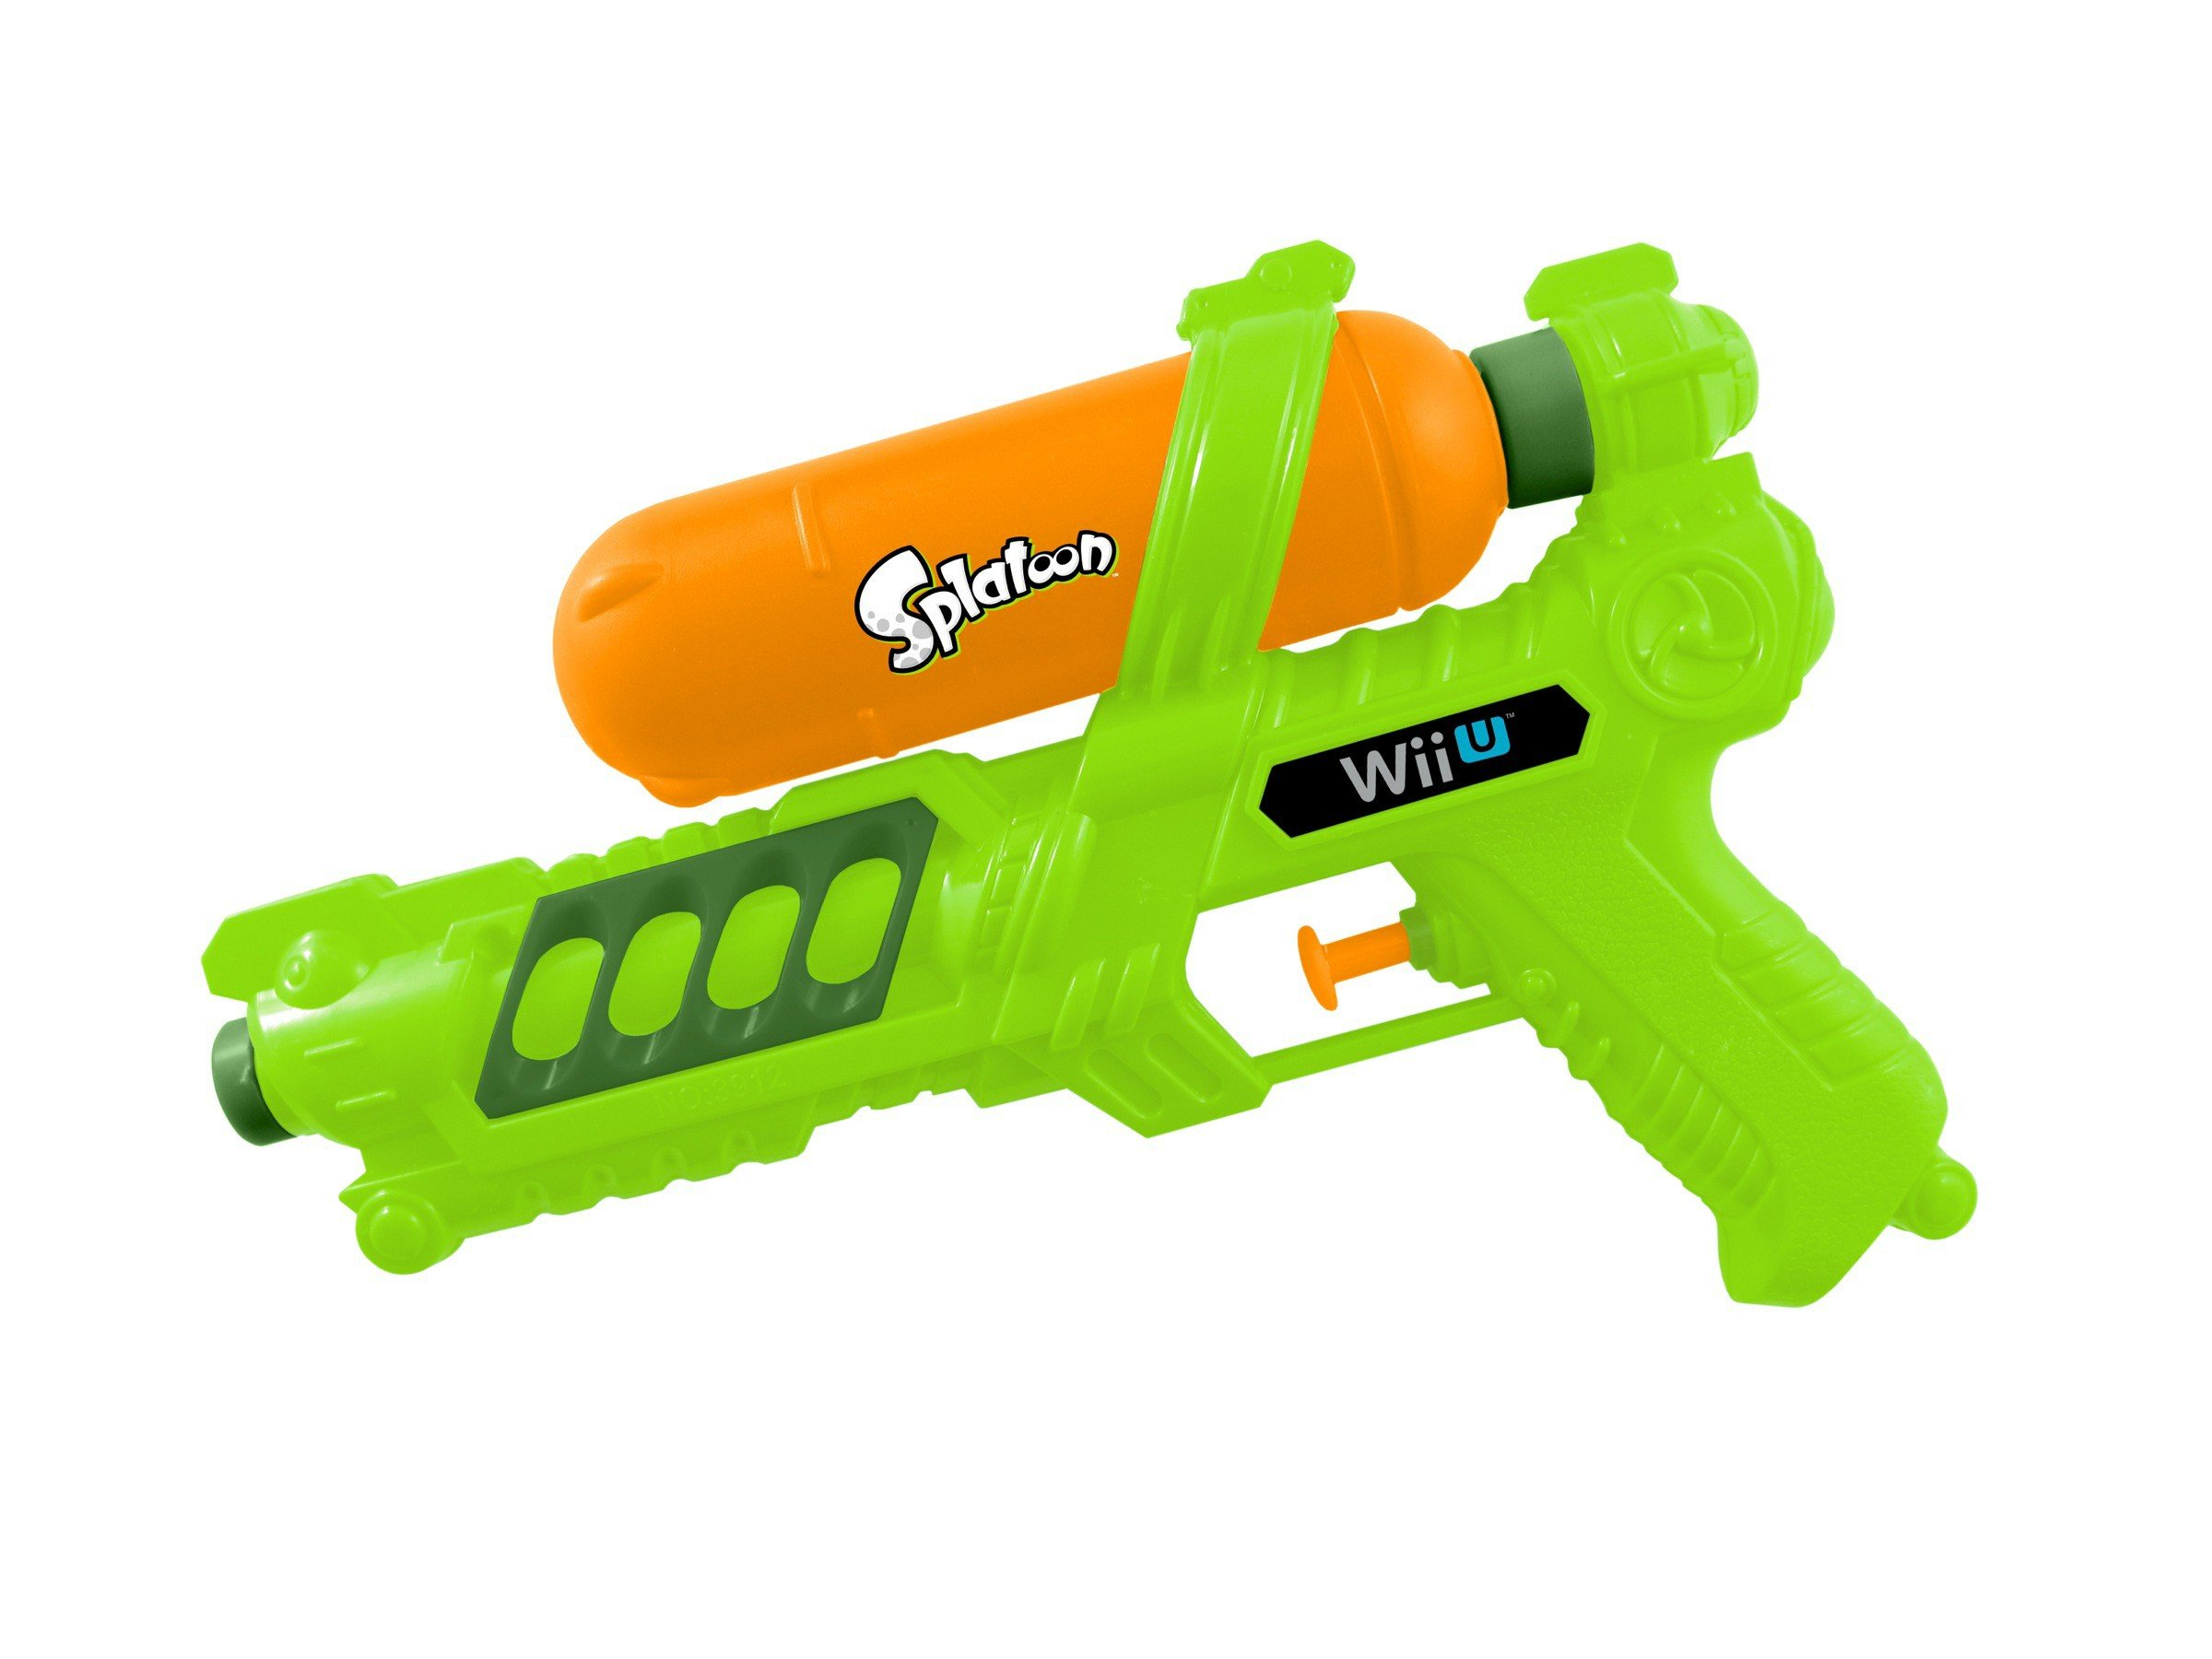 Splatoon Water Gun